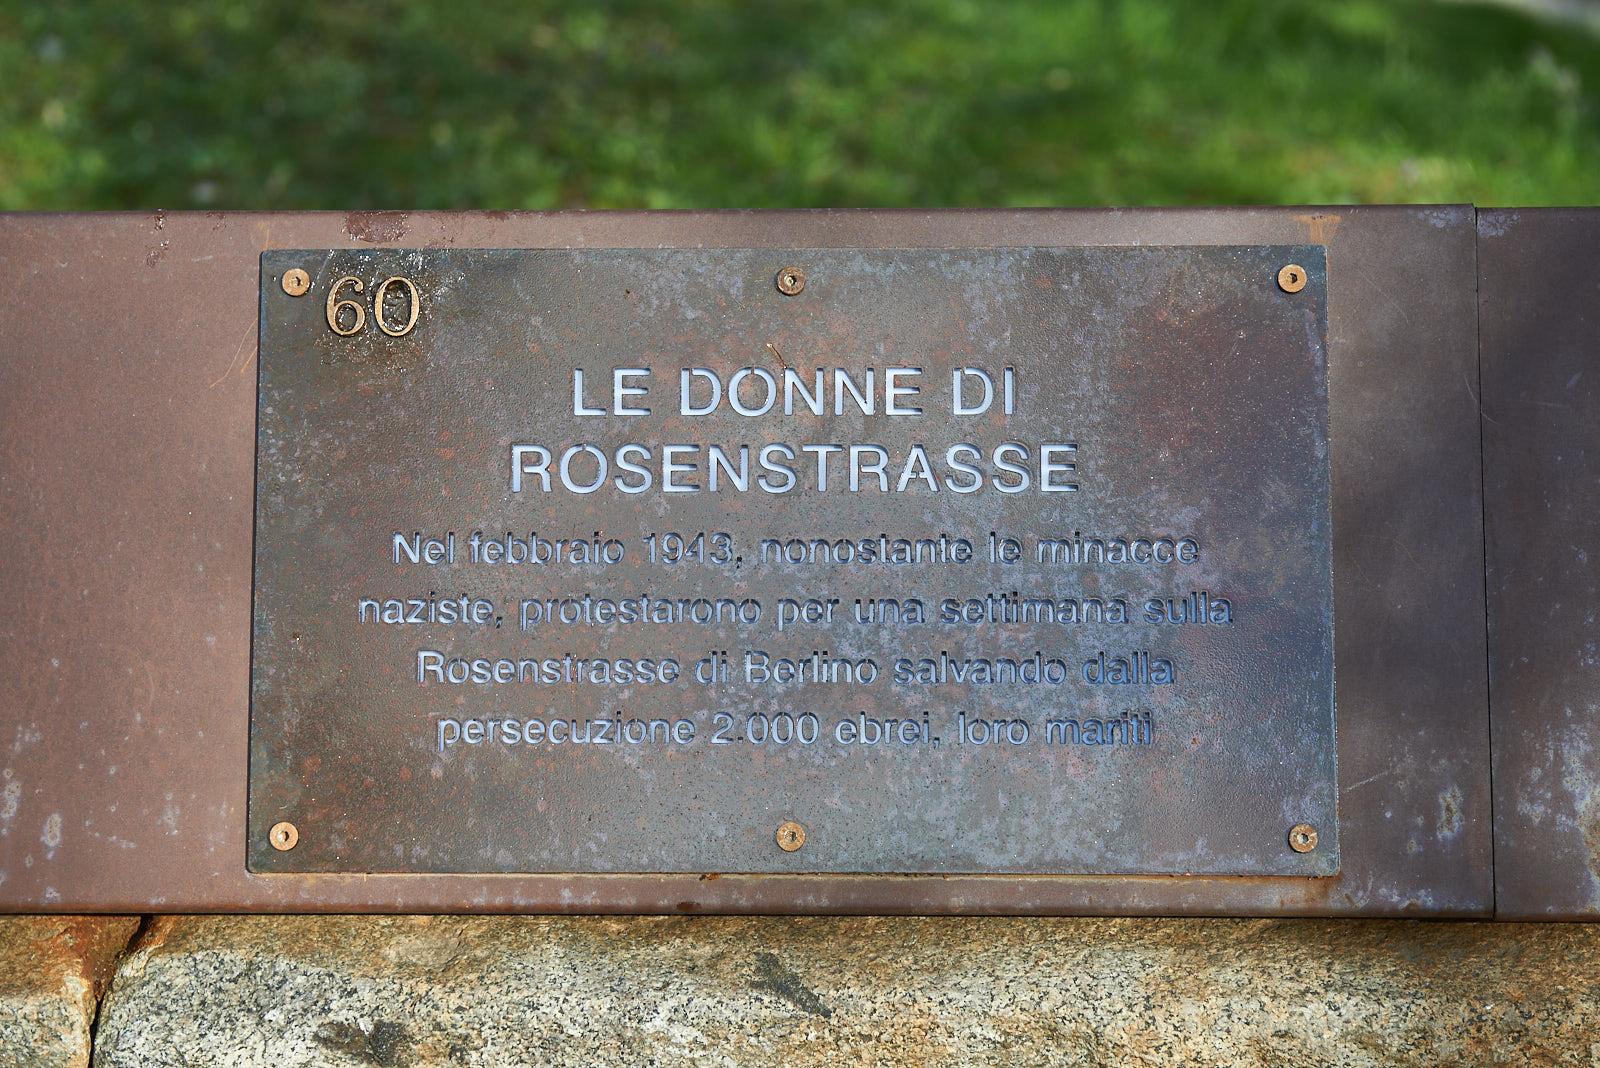 Targa dedicata alle donne di Rosenstrasse